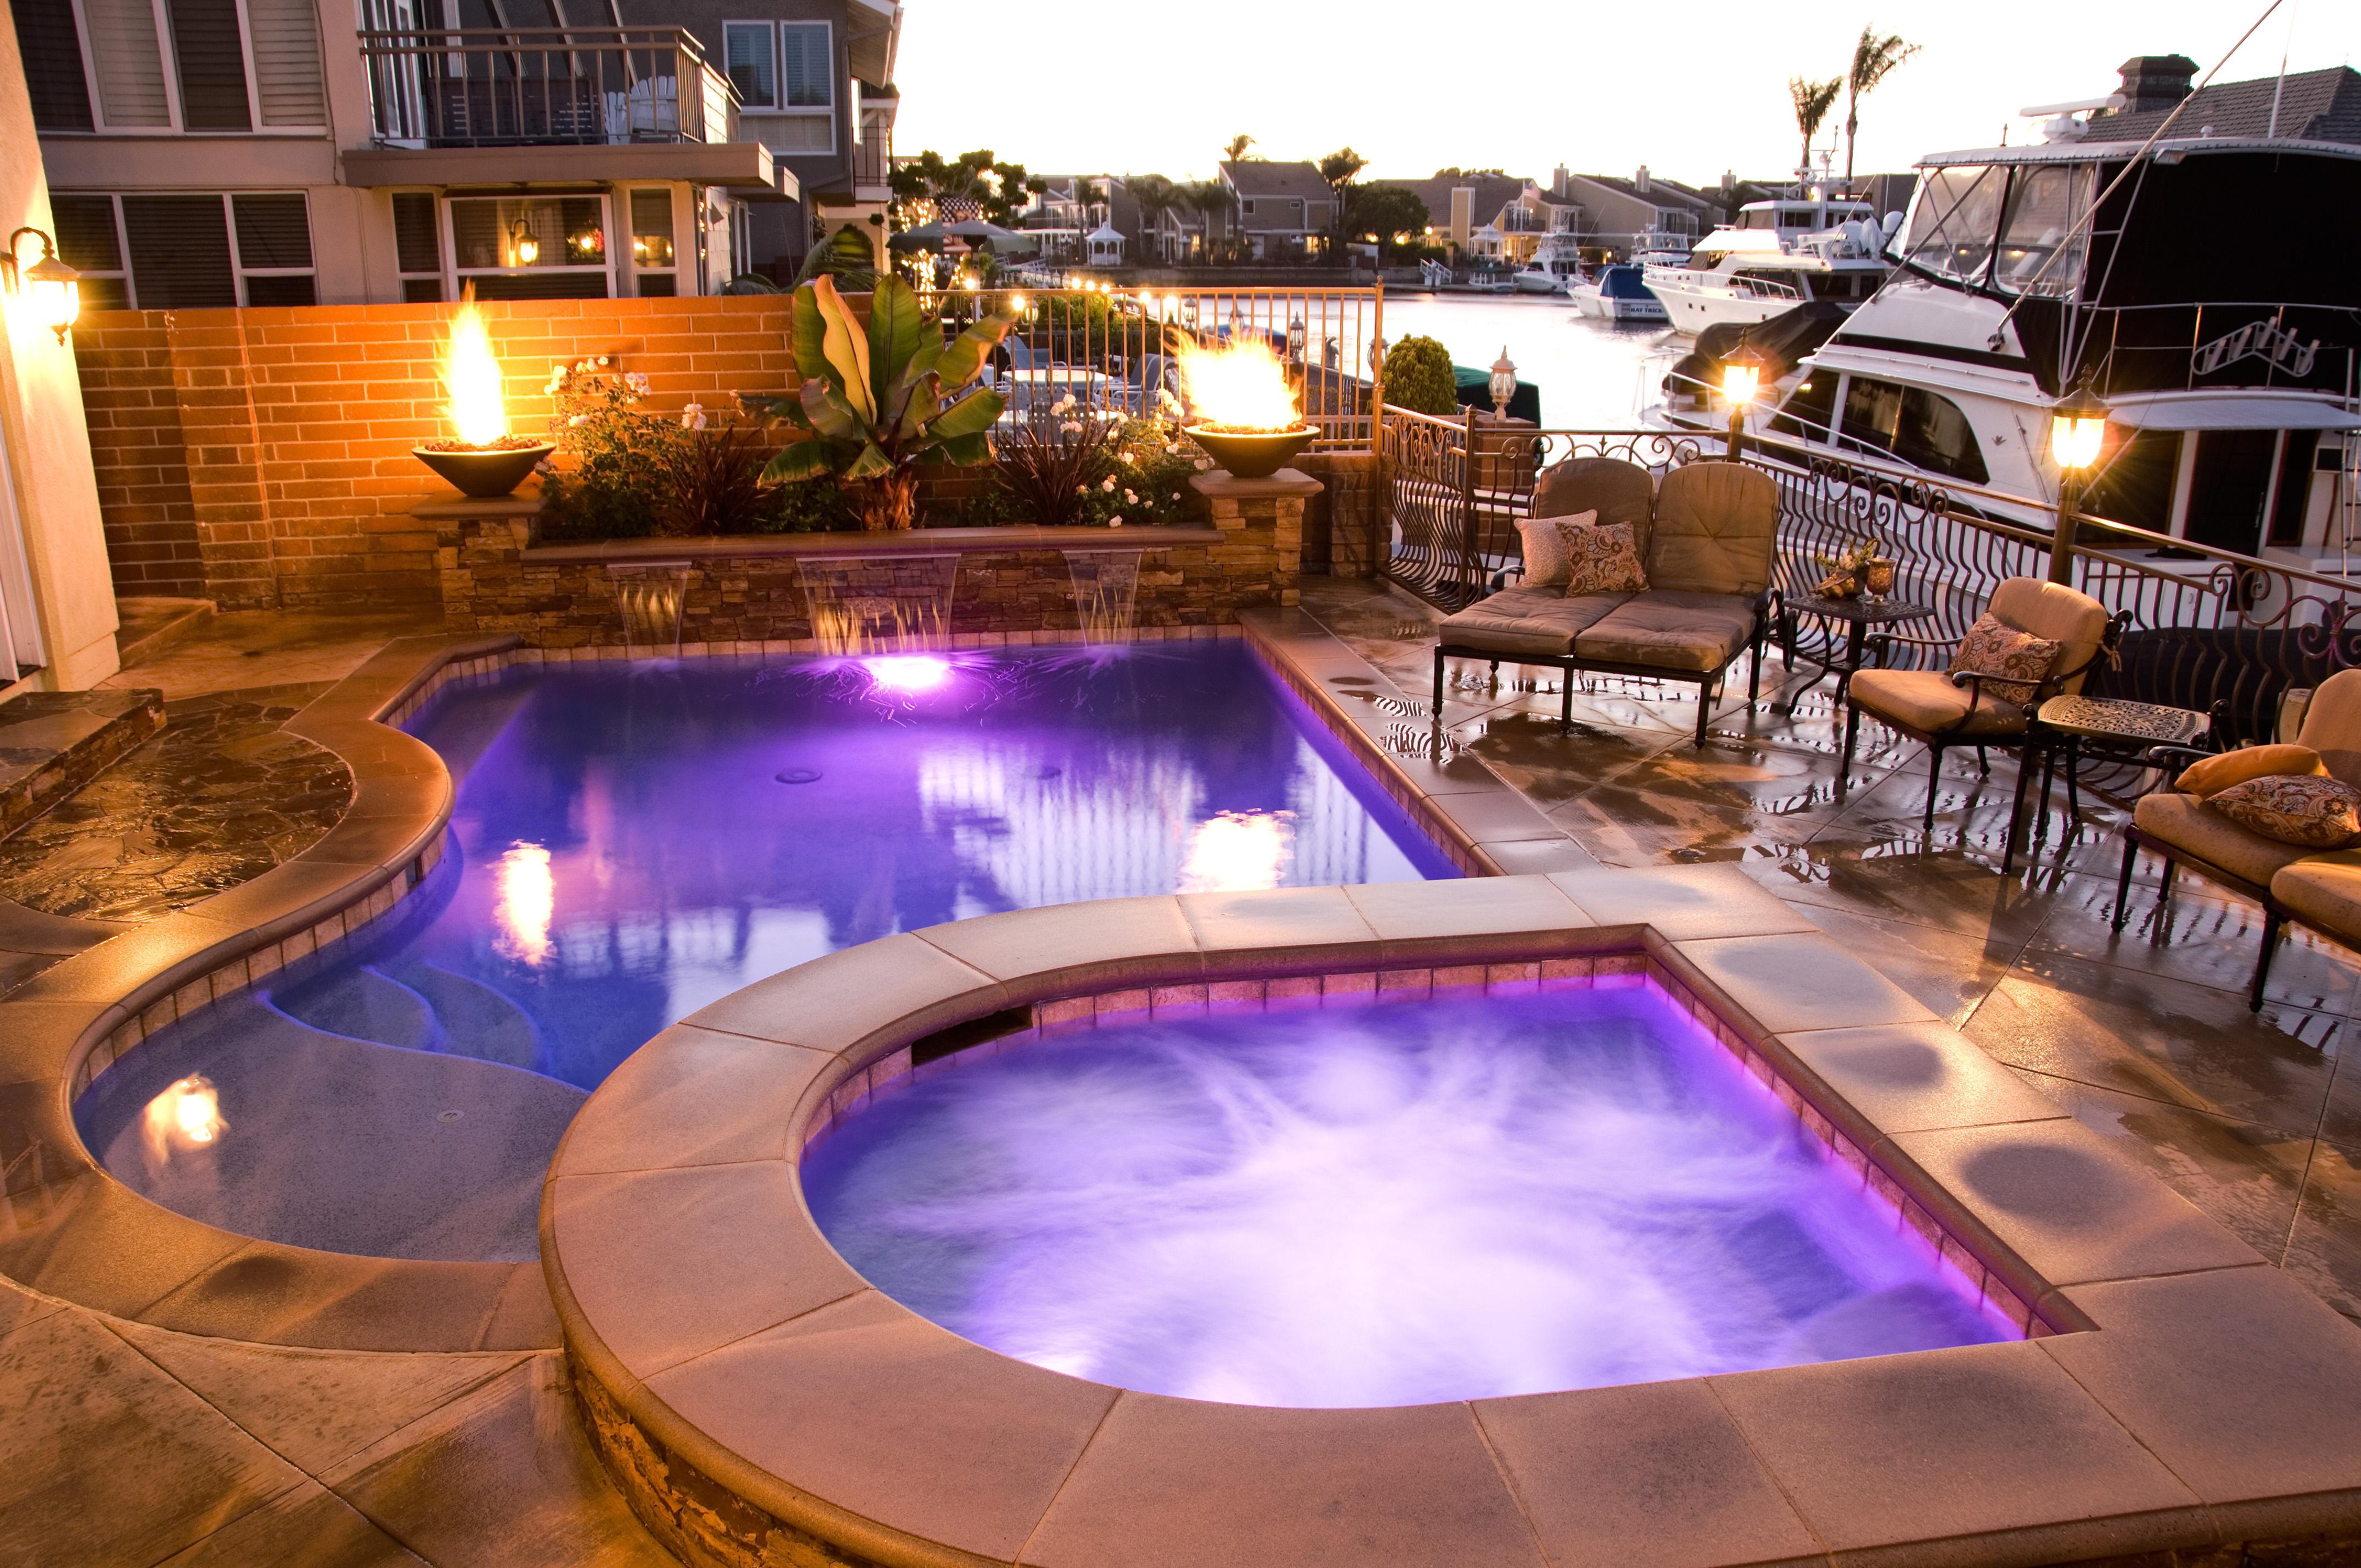 California pools irvine ca 92618 angies list for Pool and spa show wa